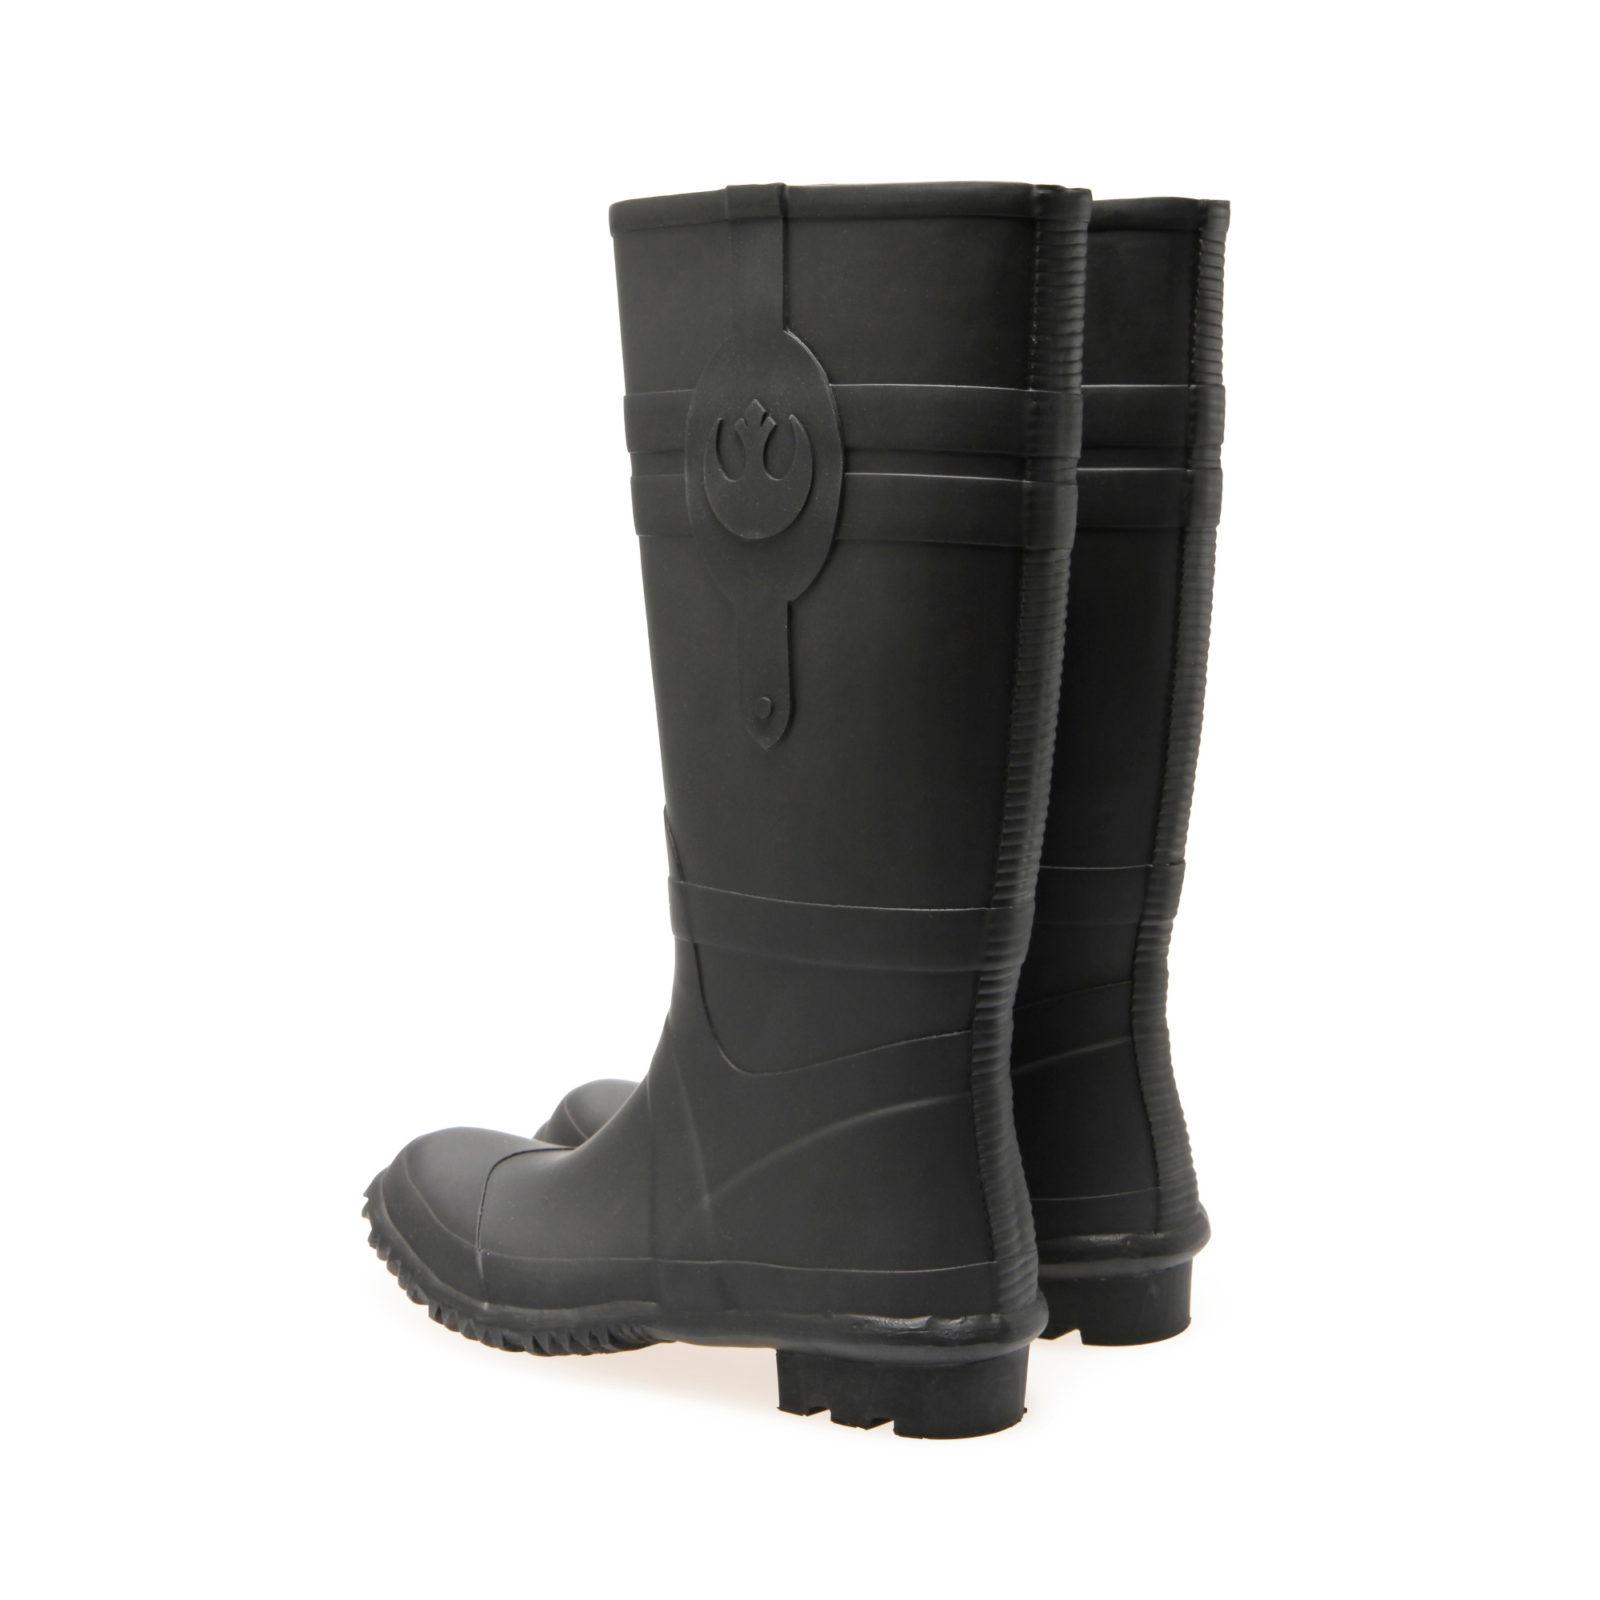 Po-Zu x Star Wars Resistance Rain Boots